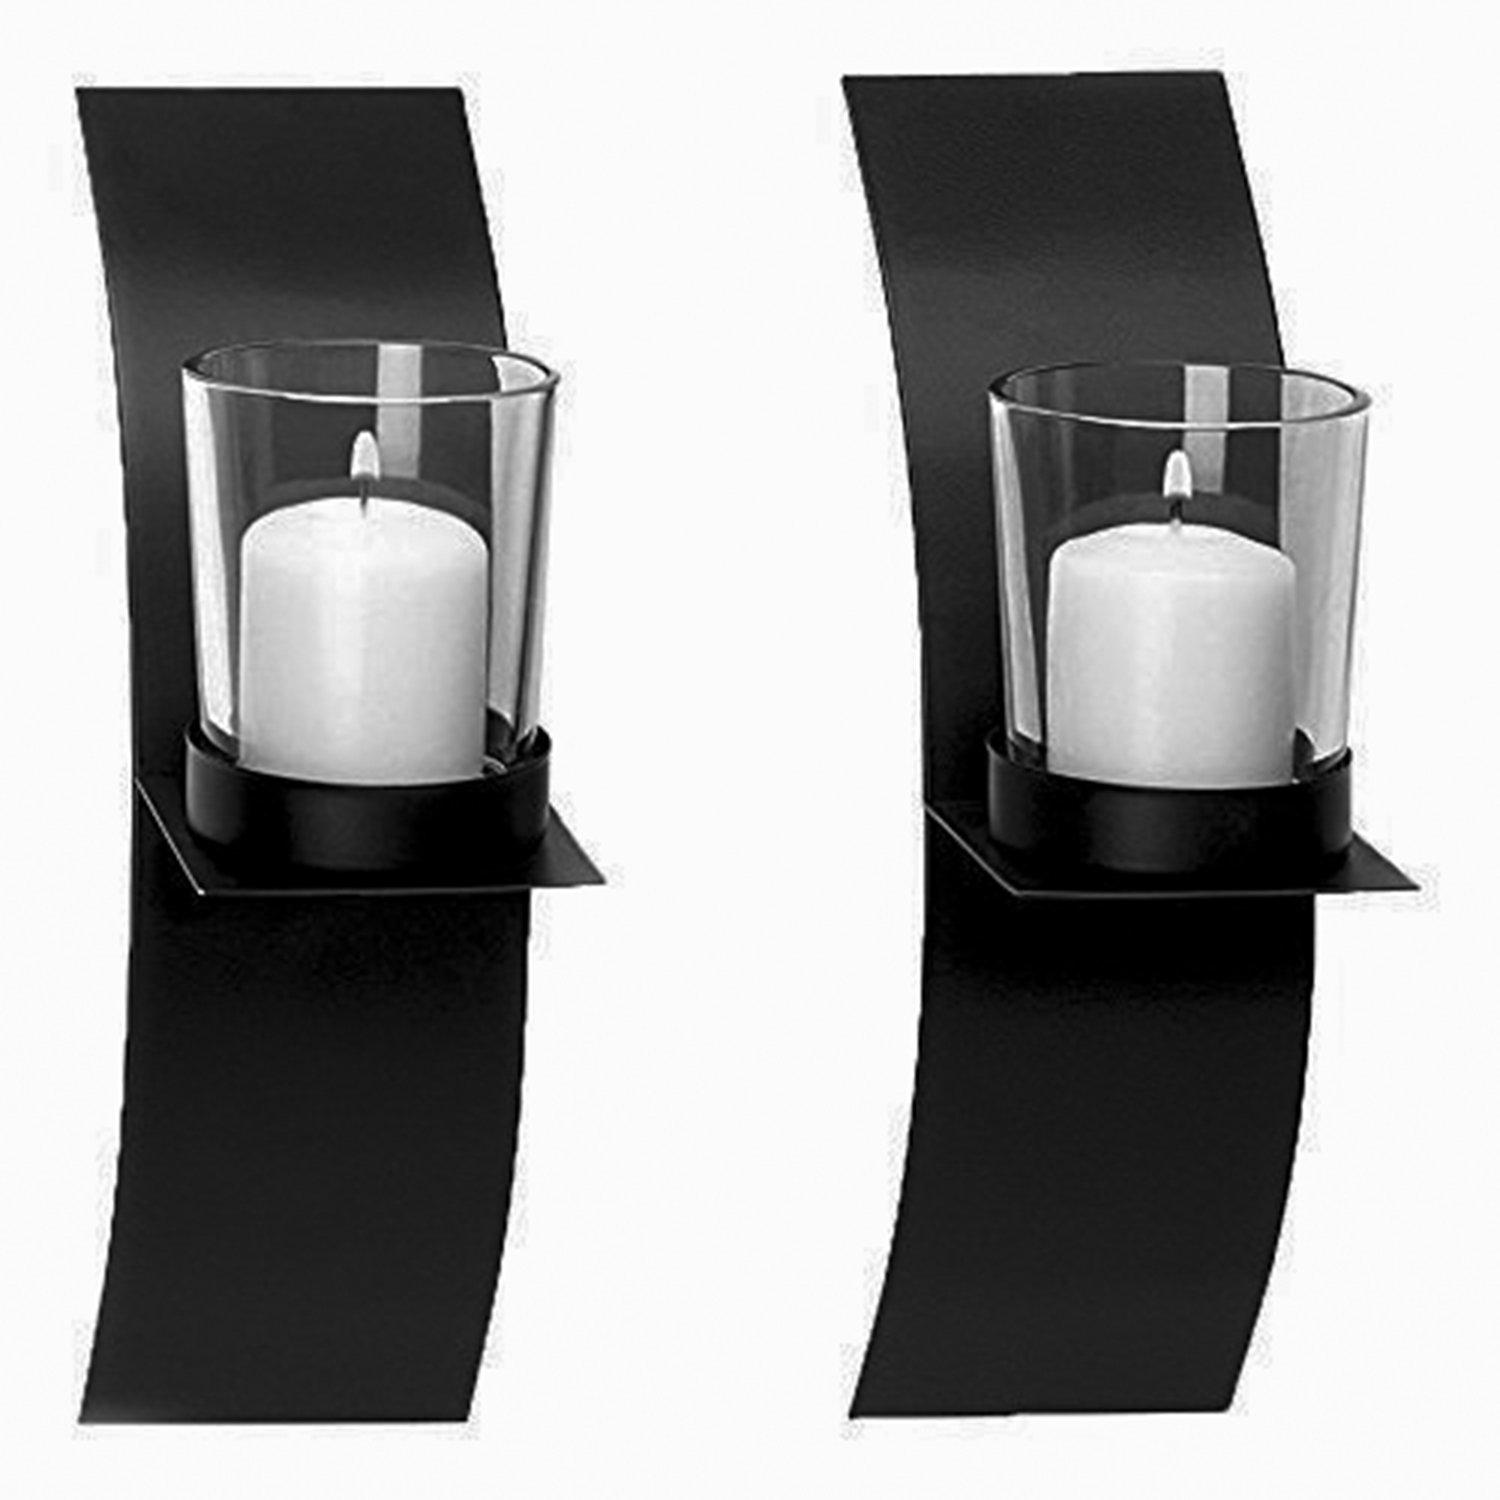 Adorox Candle Holder Modern Minimalist Art (Sconces Holder)